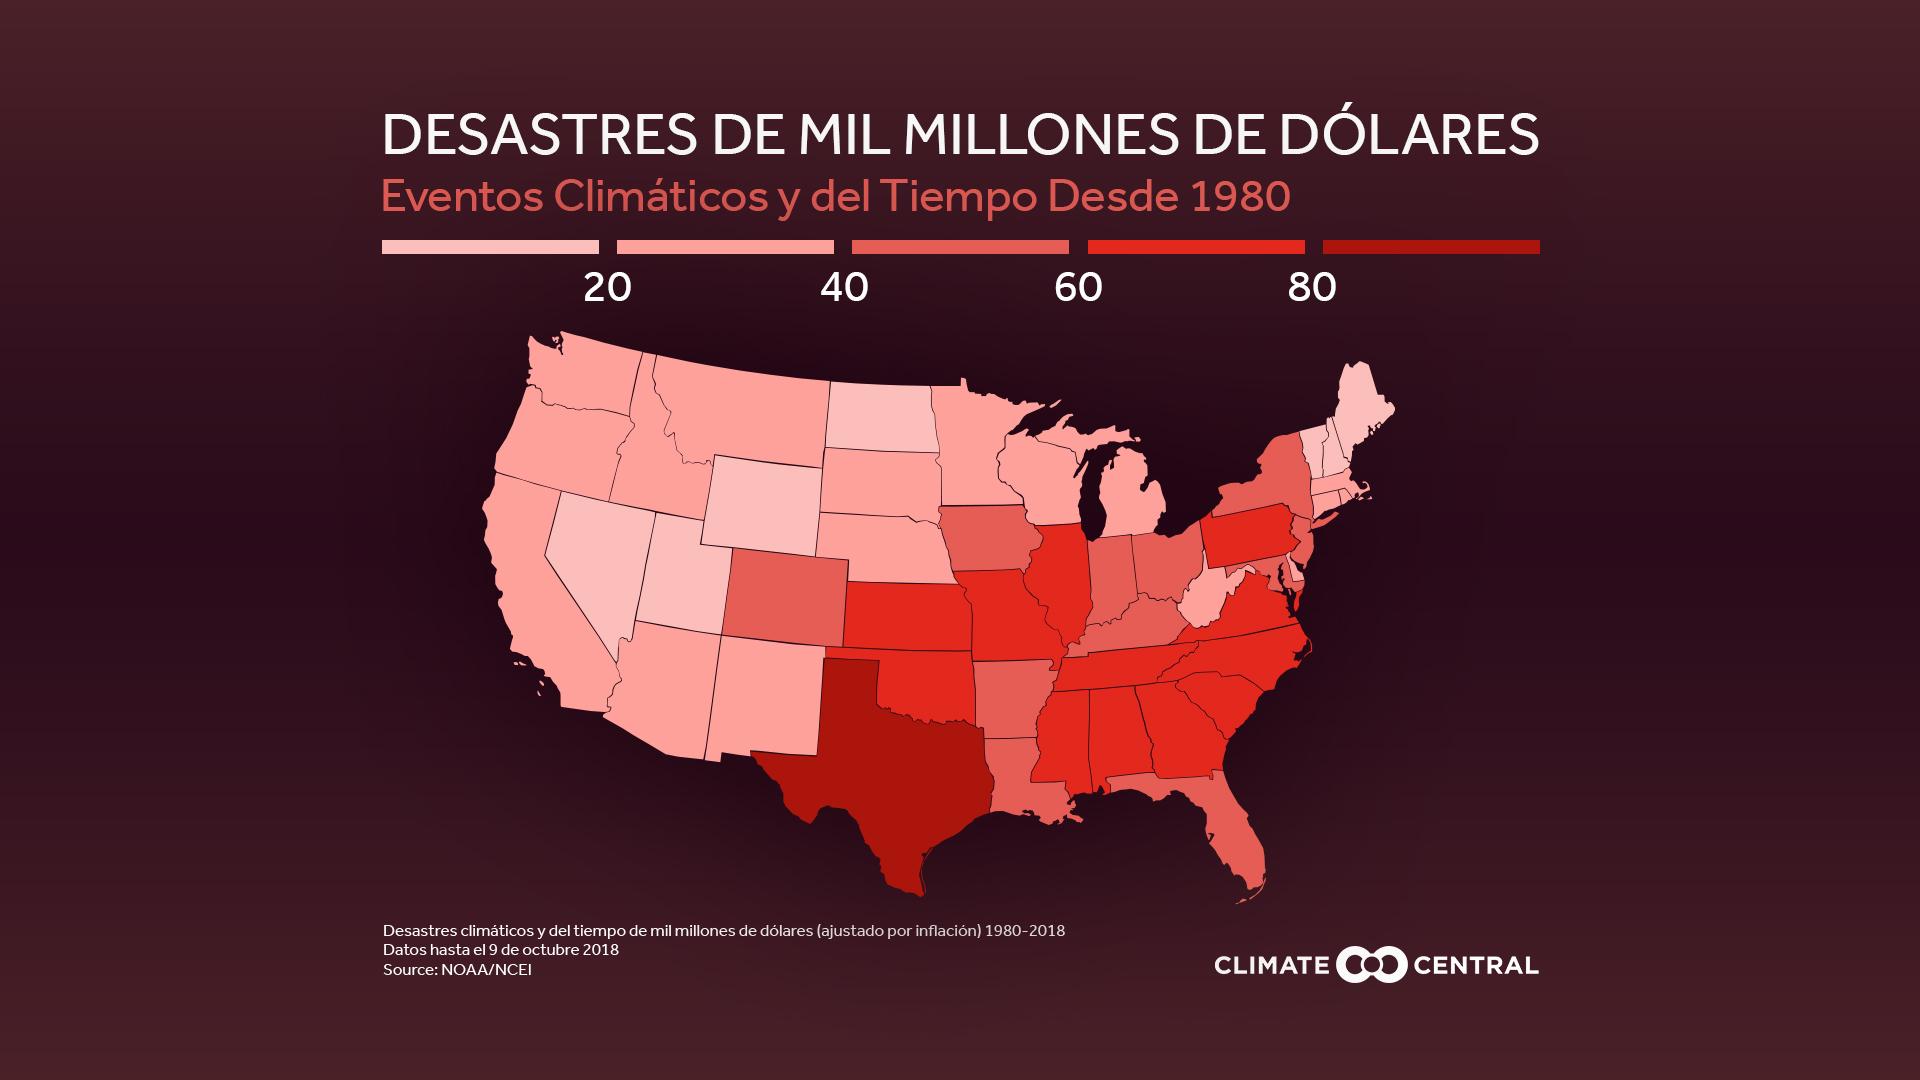 billion-dollar disasters